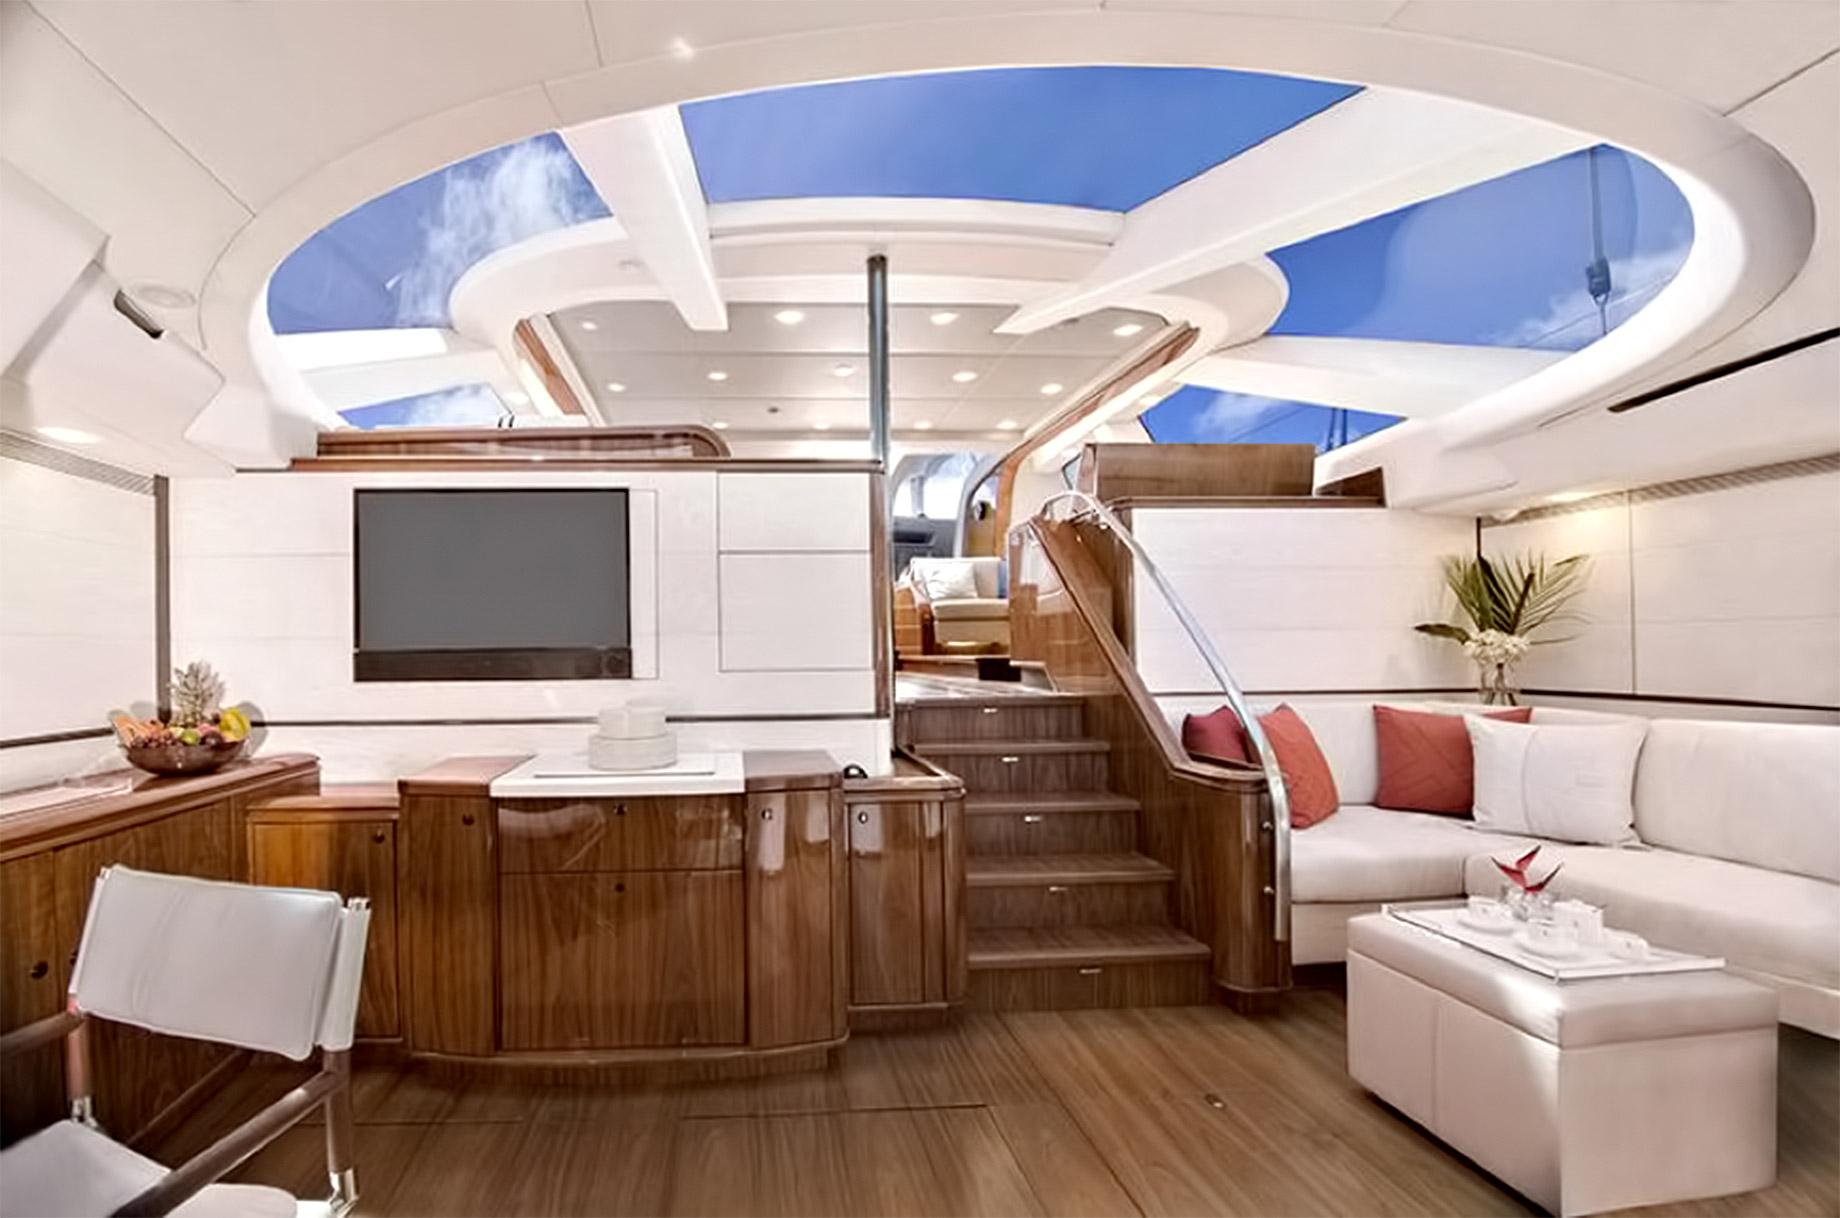 Ultra Generous Accommodation - Oyster 100 Penelope - Step Inside A Luxury British Sailing Yacht